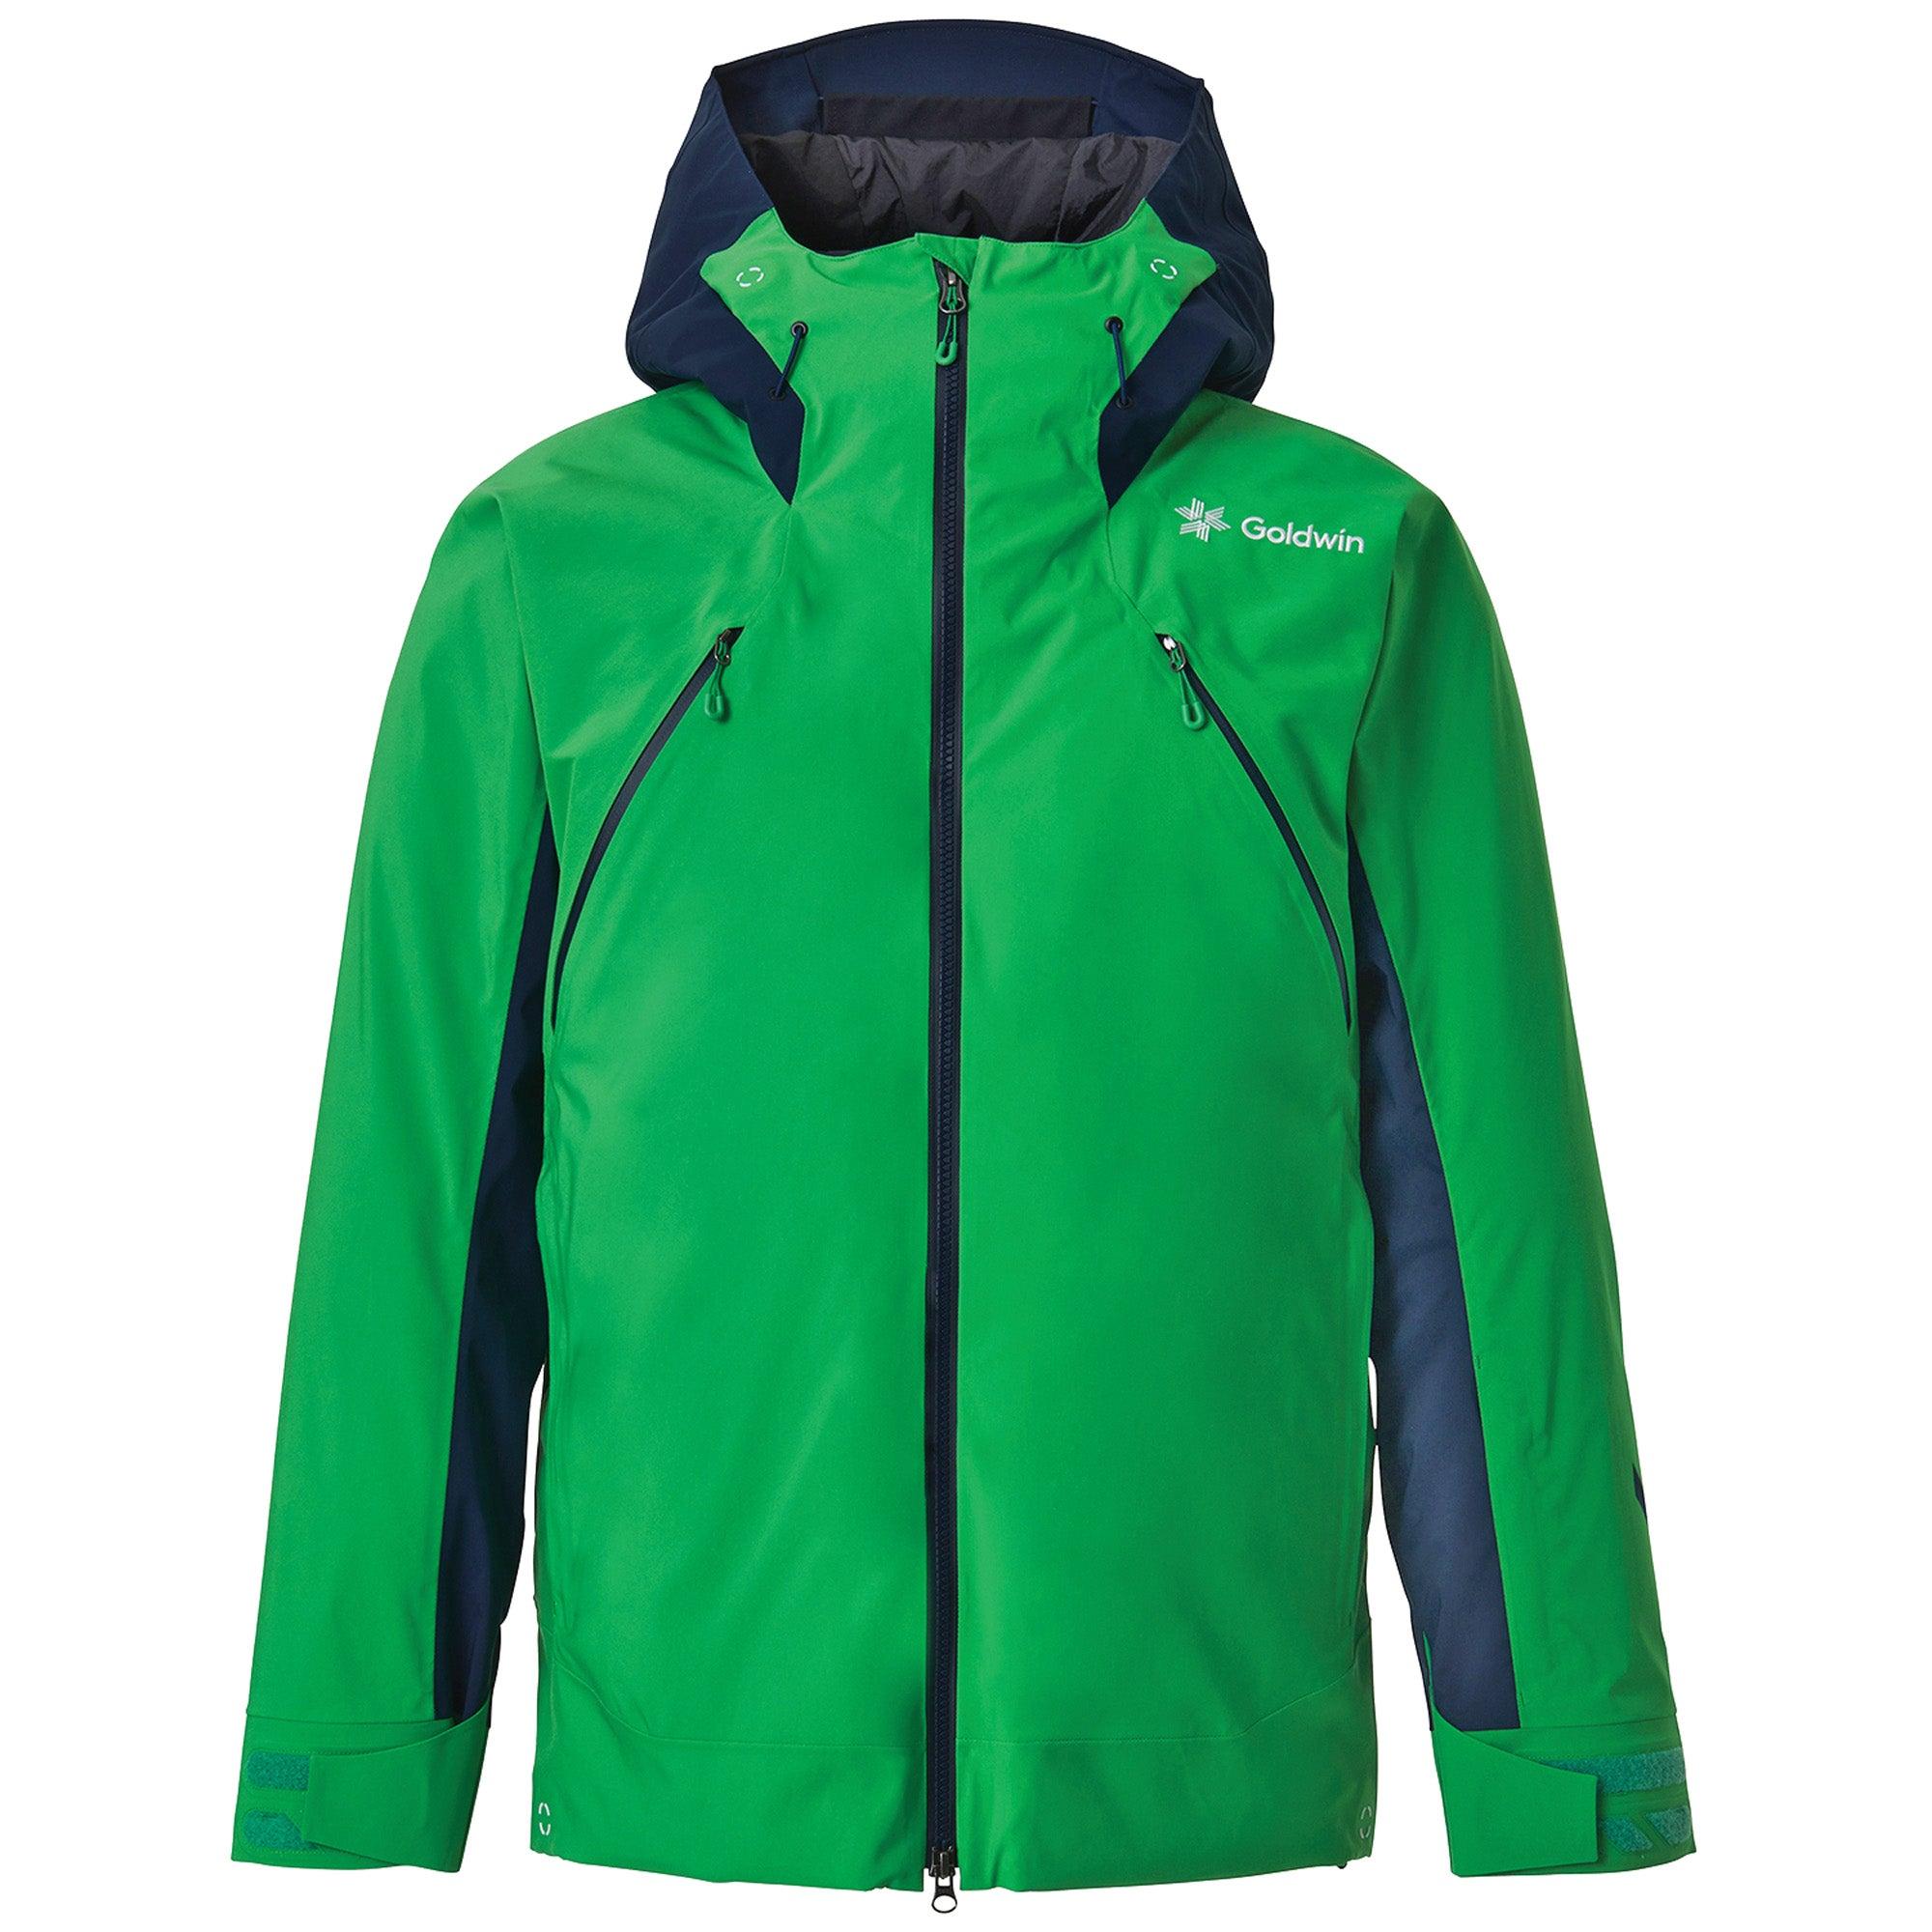 2021 Goldwin Aither Jacket